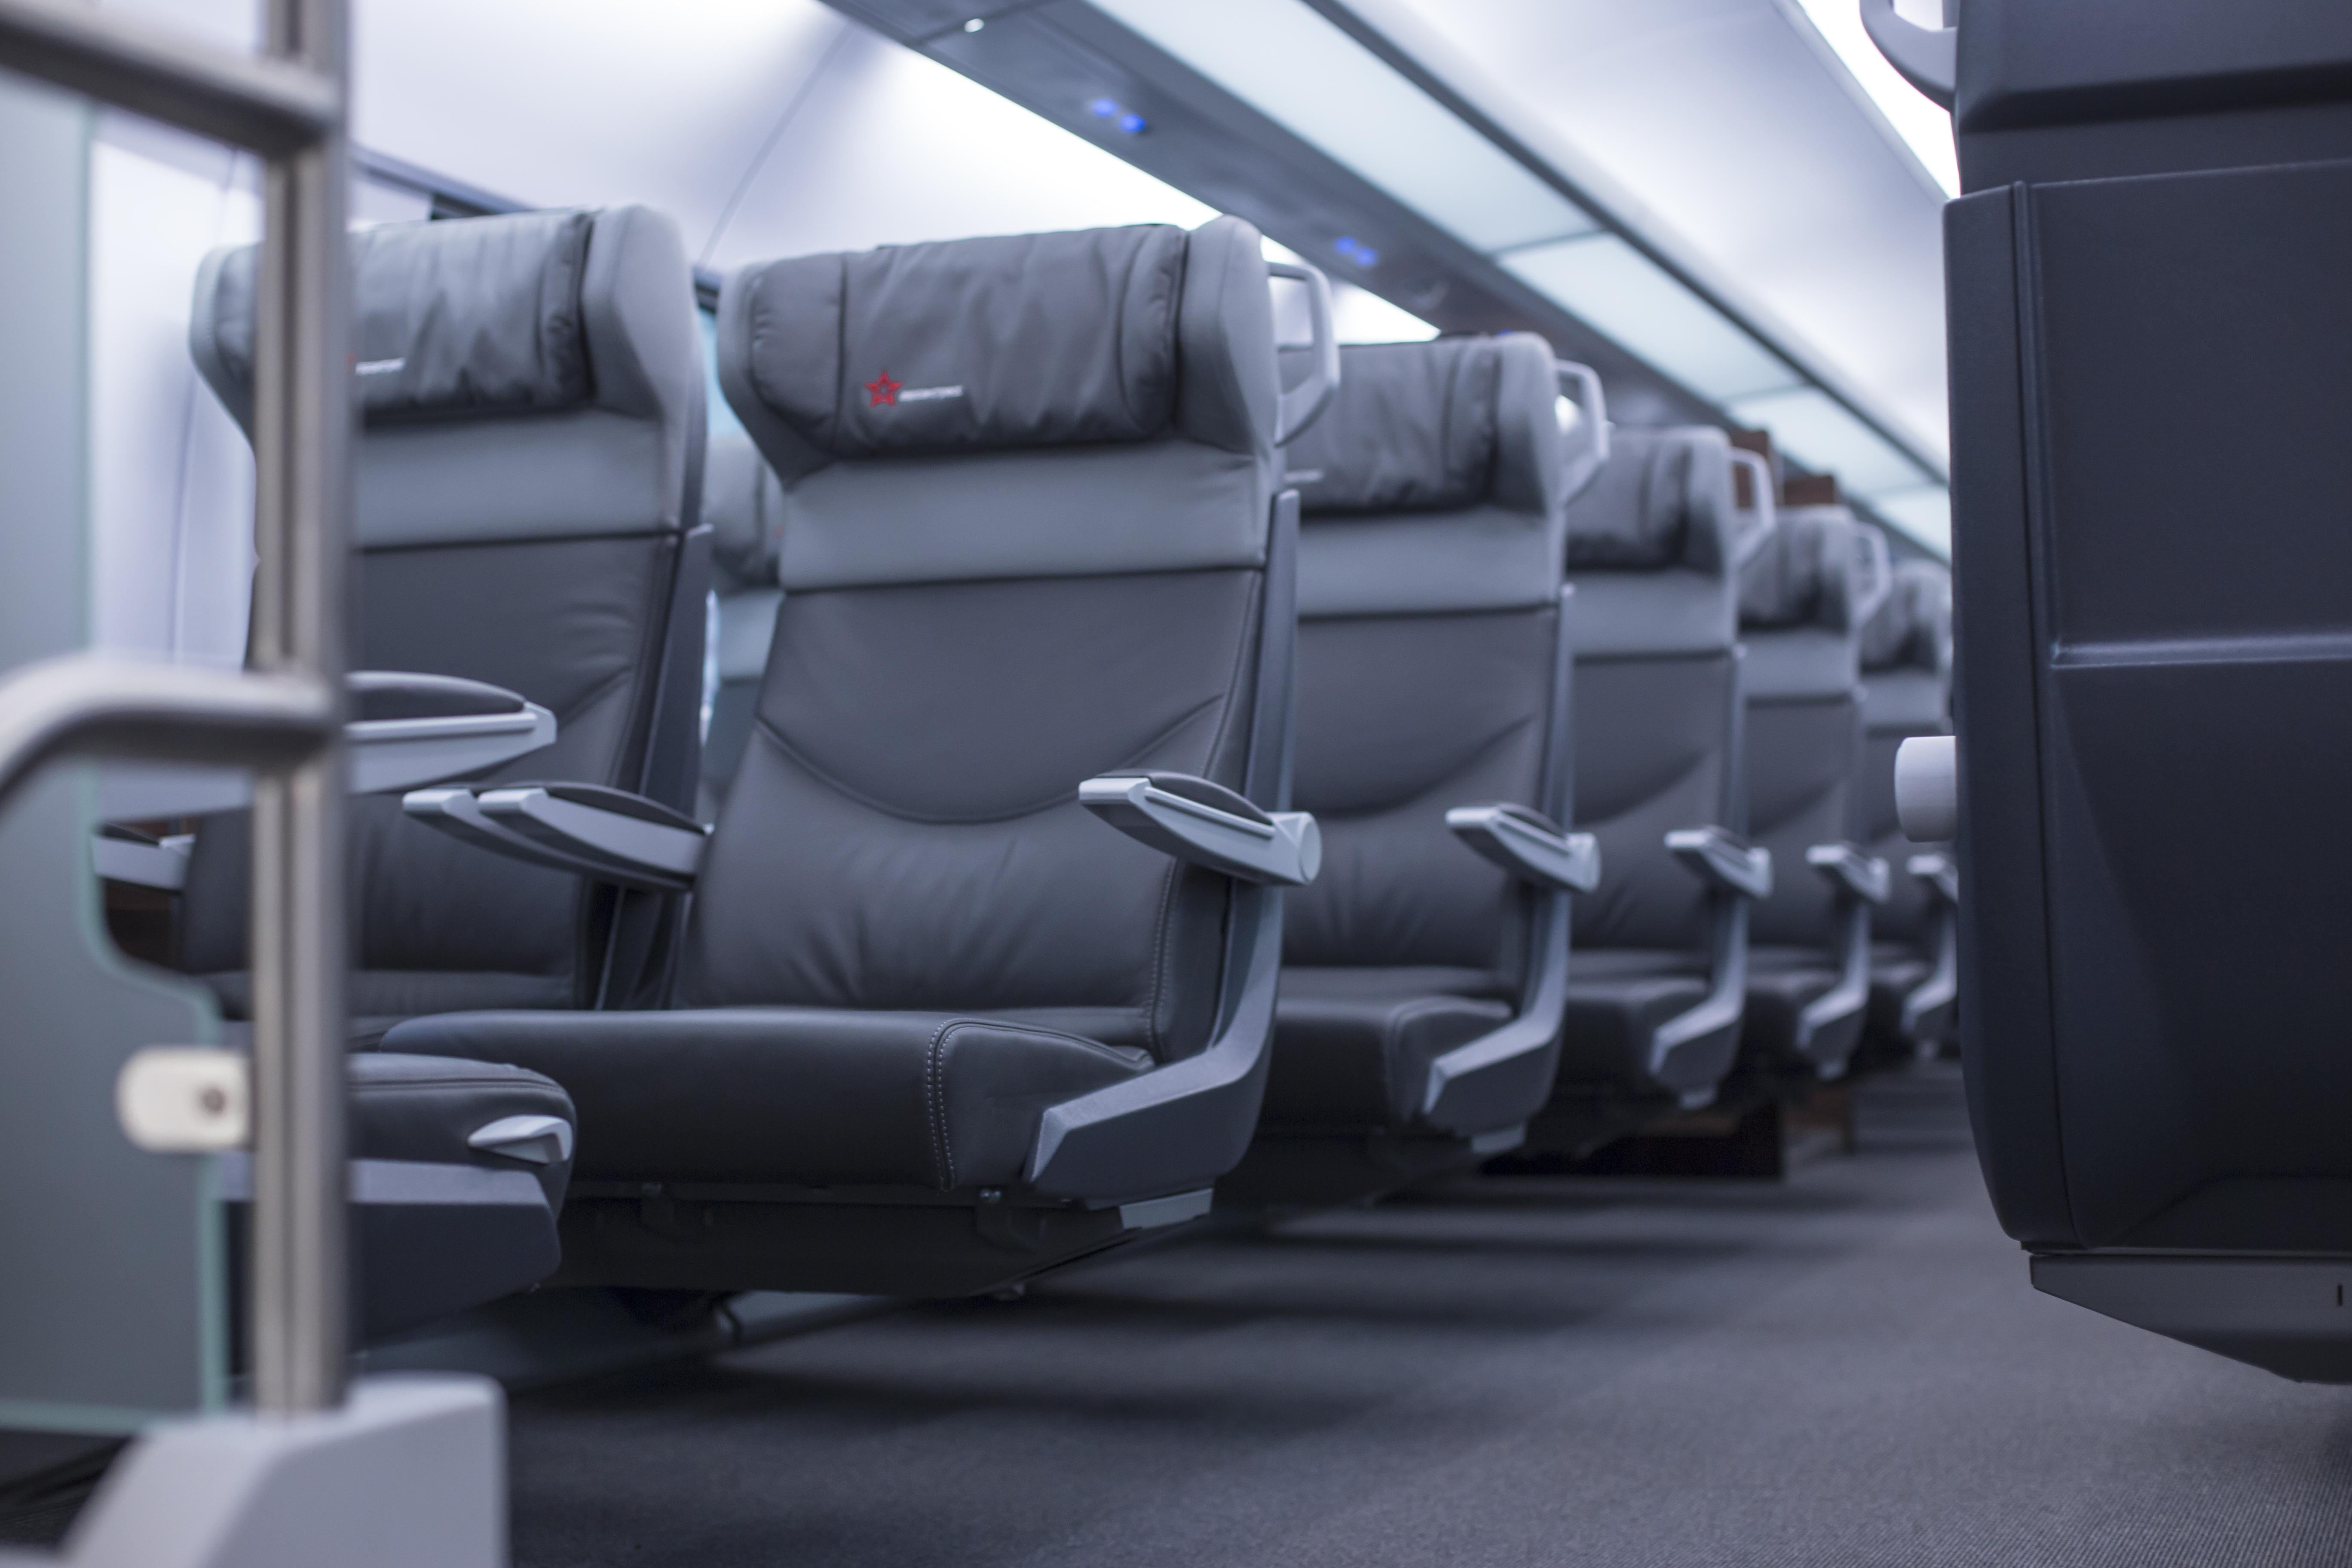 Aeroexpress: how its service is arranged